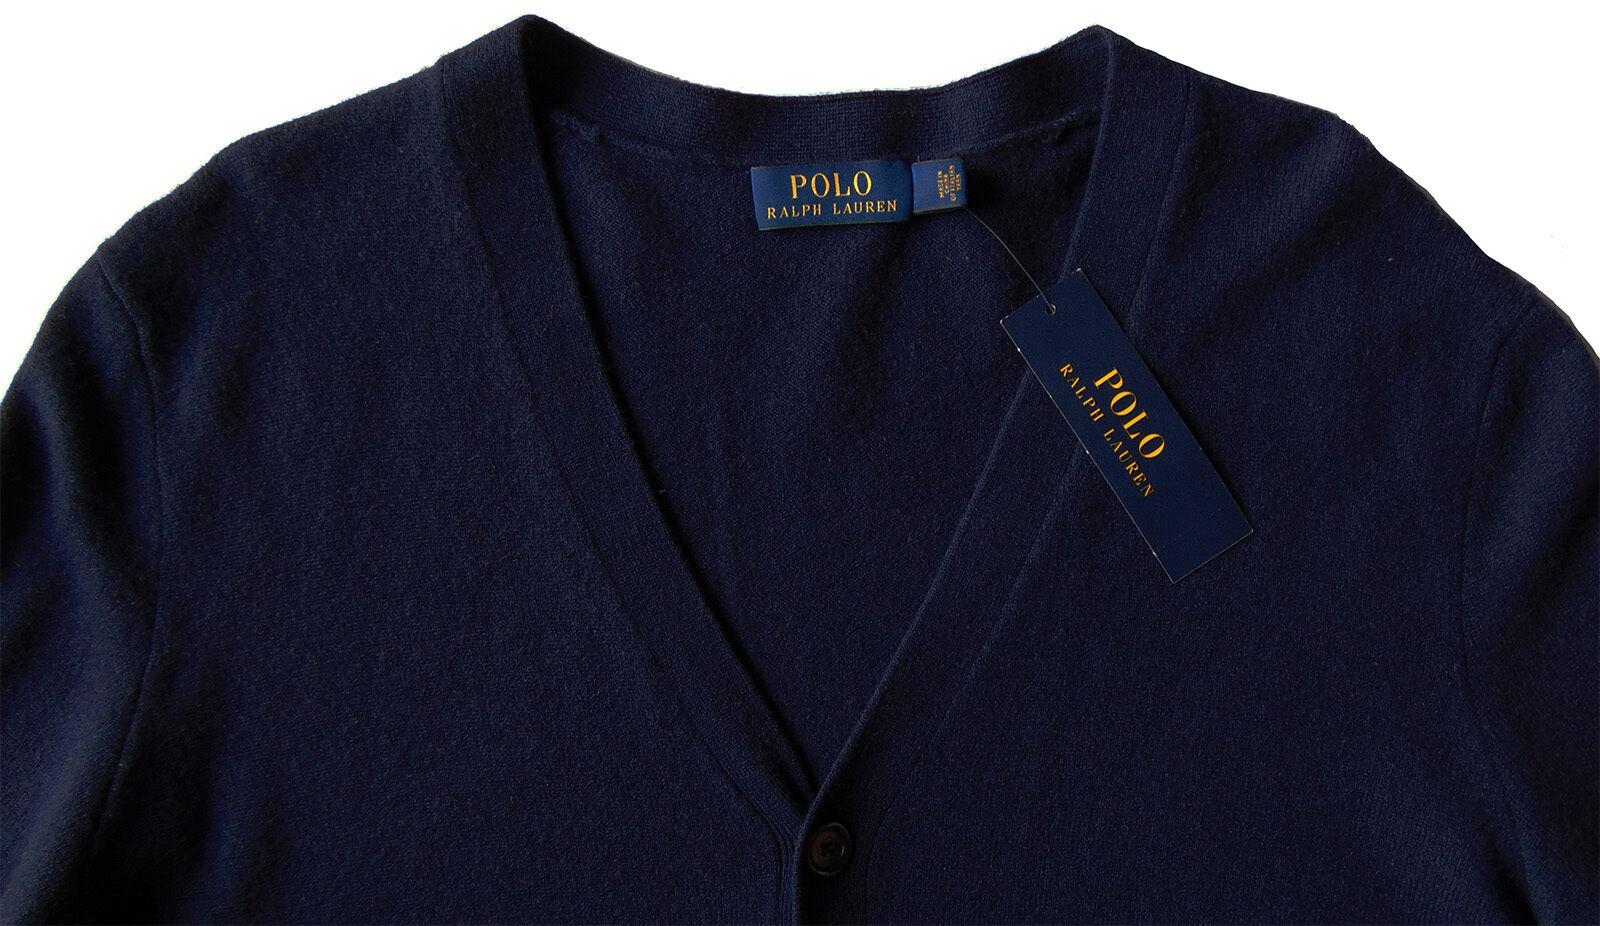 Uomo's RALPH Navy LAUREN Navy RALPH blu Merino Lana Cardigan Sweater Small S NWT NEW  185+ ee9d01